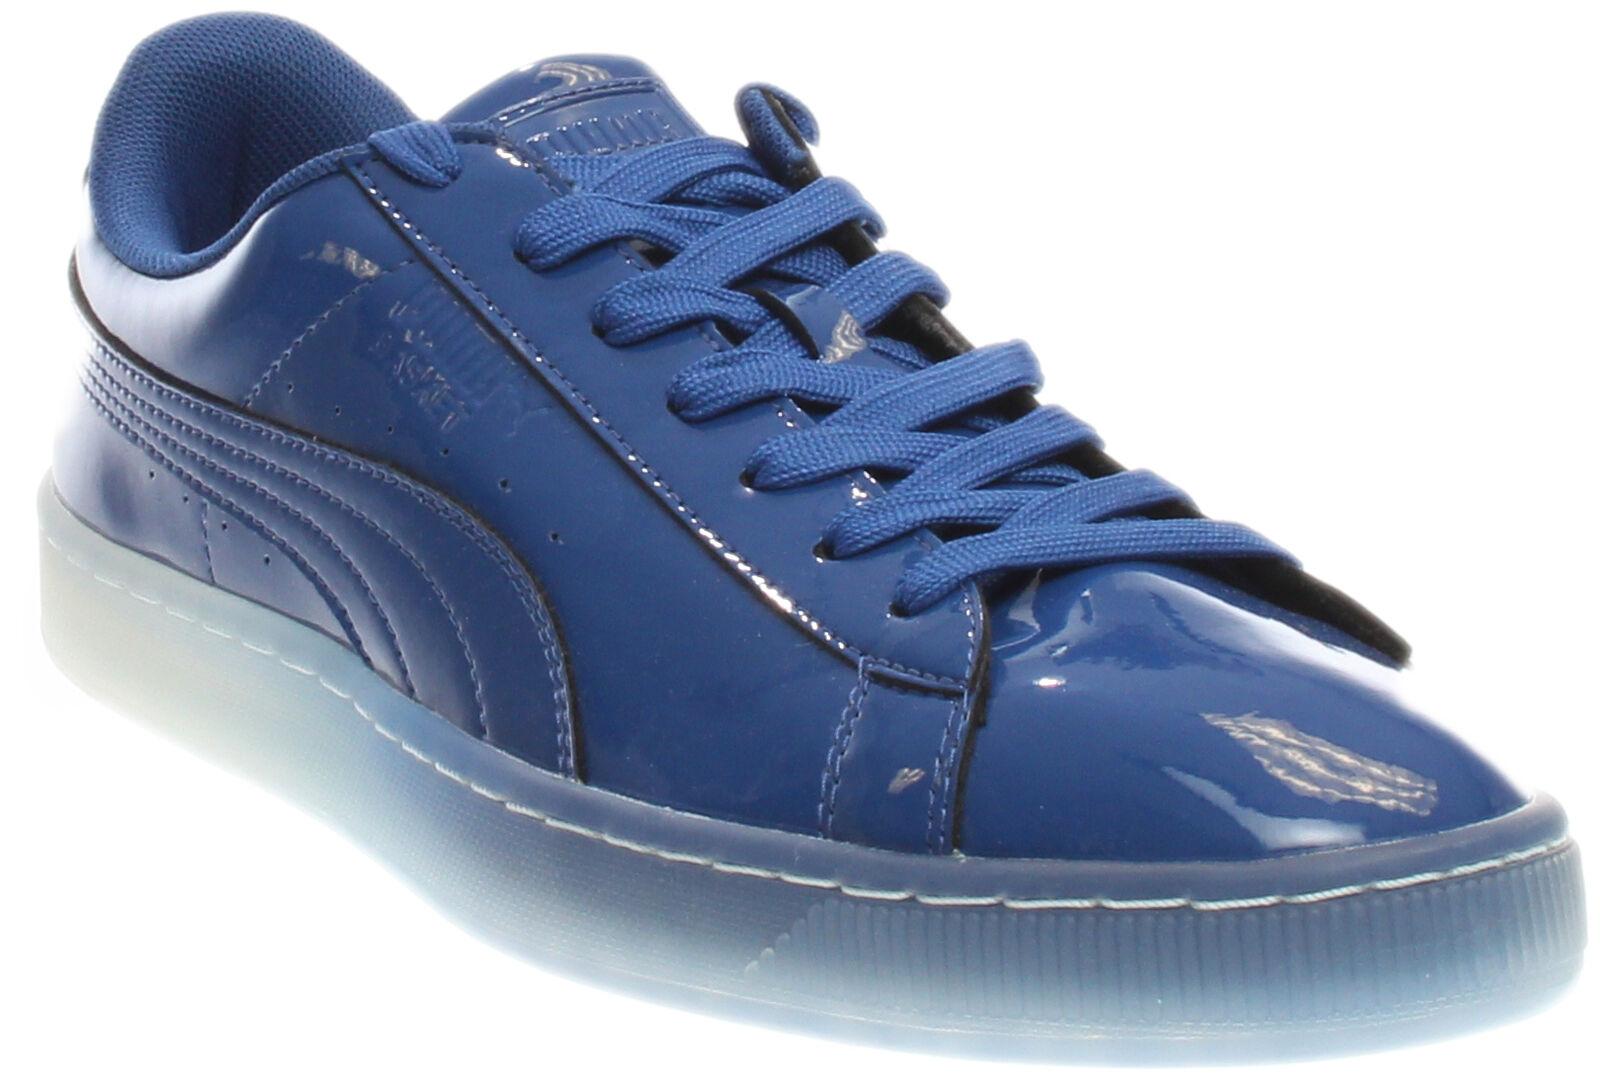 Puma Basket Patent Ice Fade - Blue - Mens